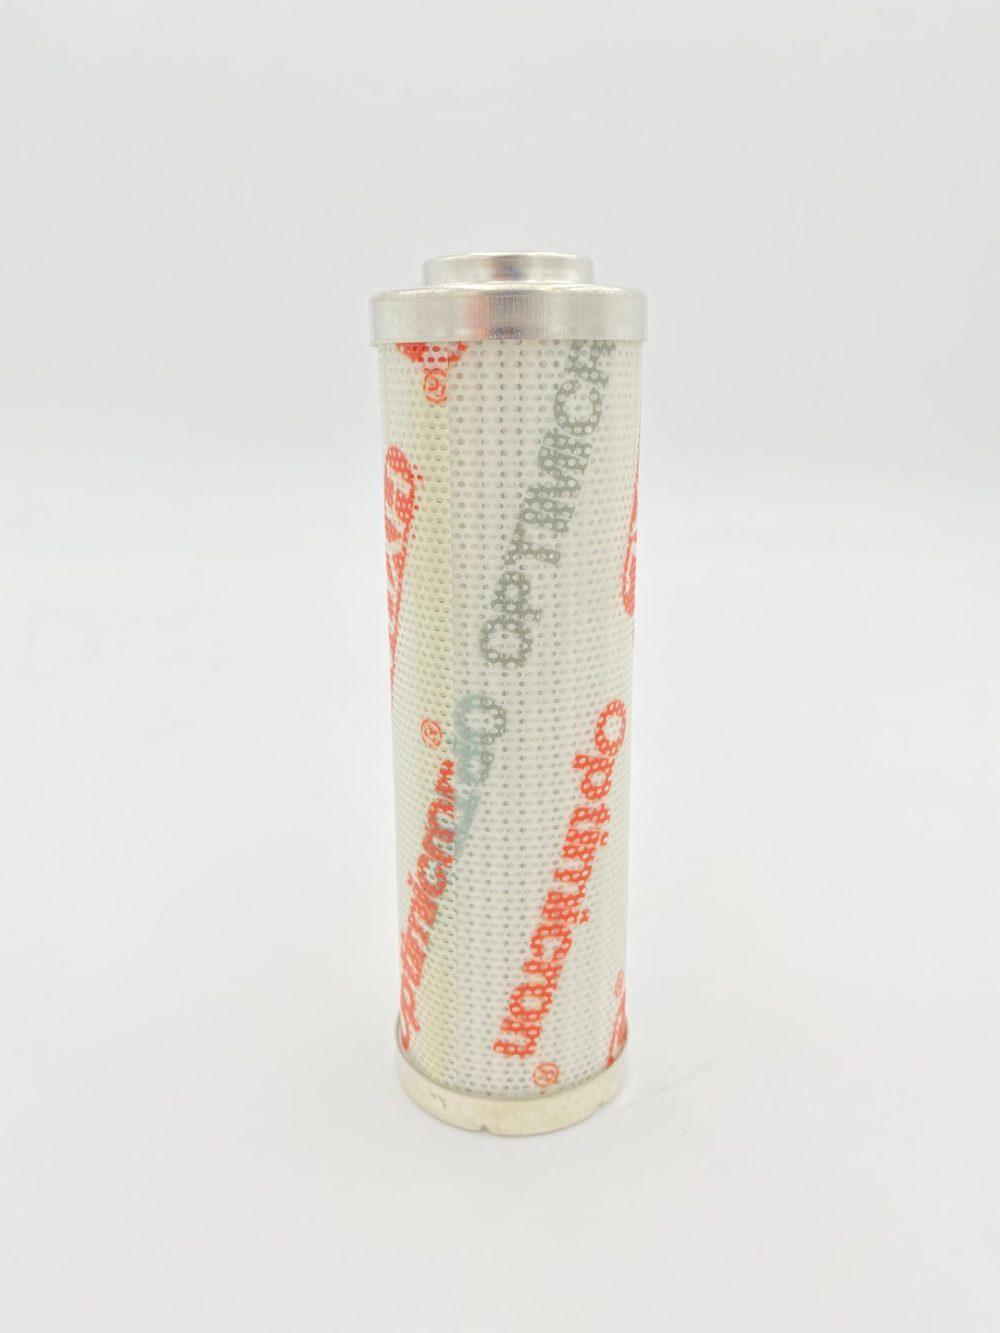 Hydac Pressure Filter Element DF 0110 D 010 ON BN4HC for RMT B-GENIUS 10-150 and B-GENIUS 14-250 Press Brakes